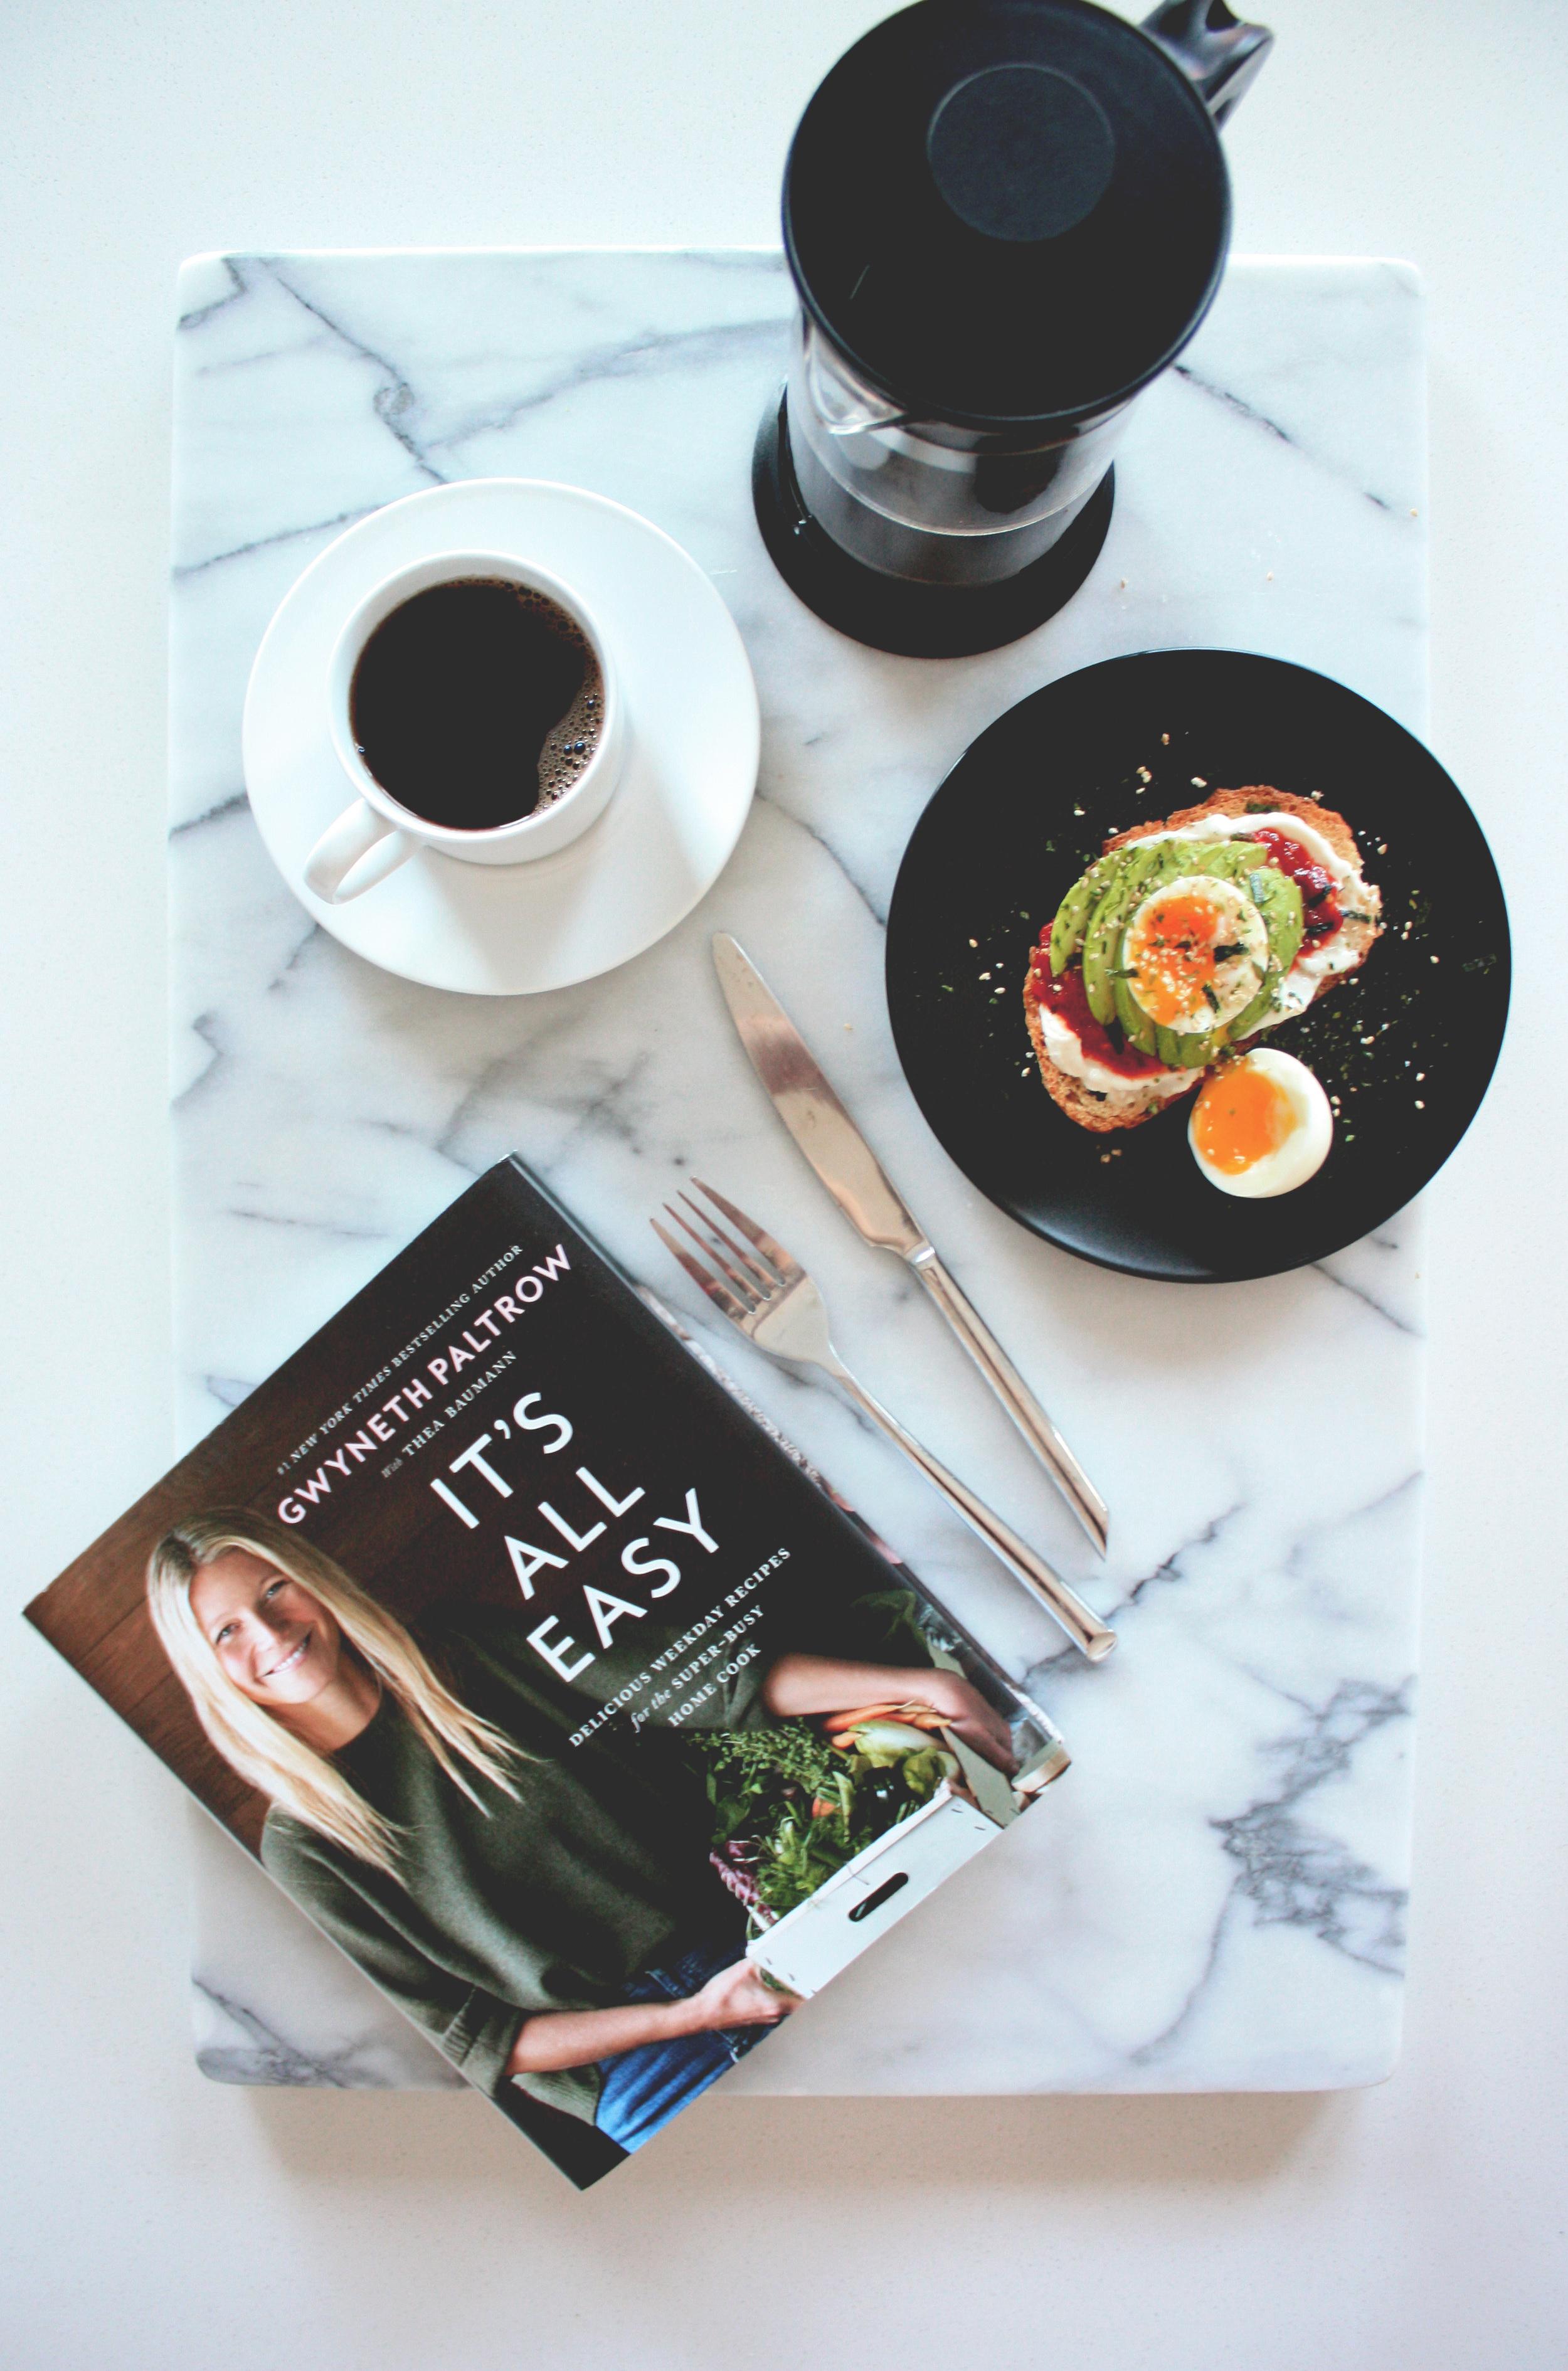 gwyneth-paltrow-goop-cookbook-avocado-toast.jpg